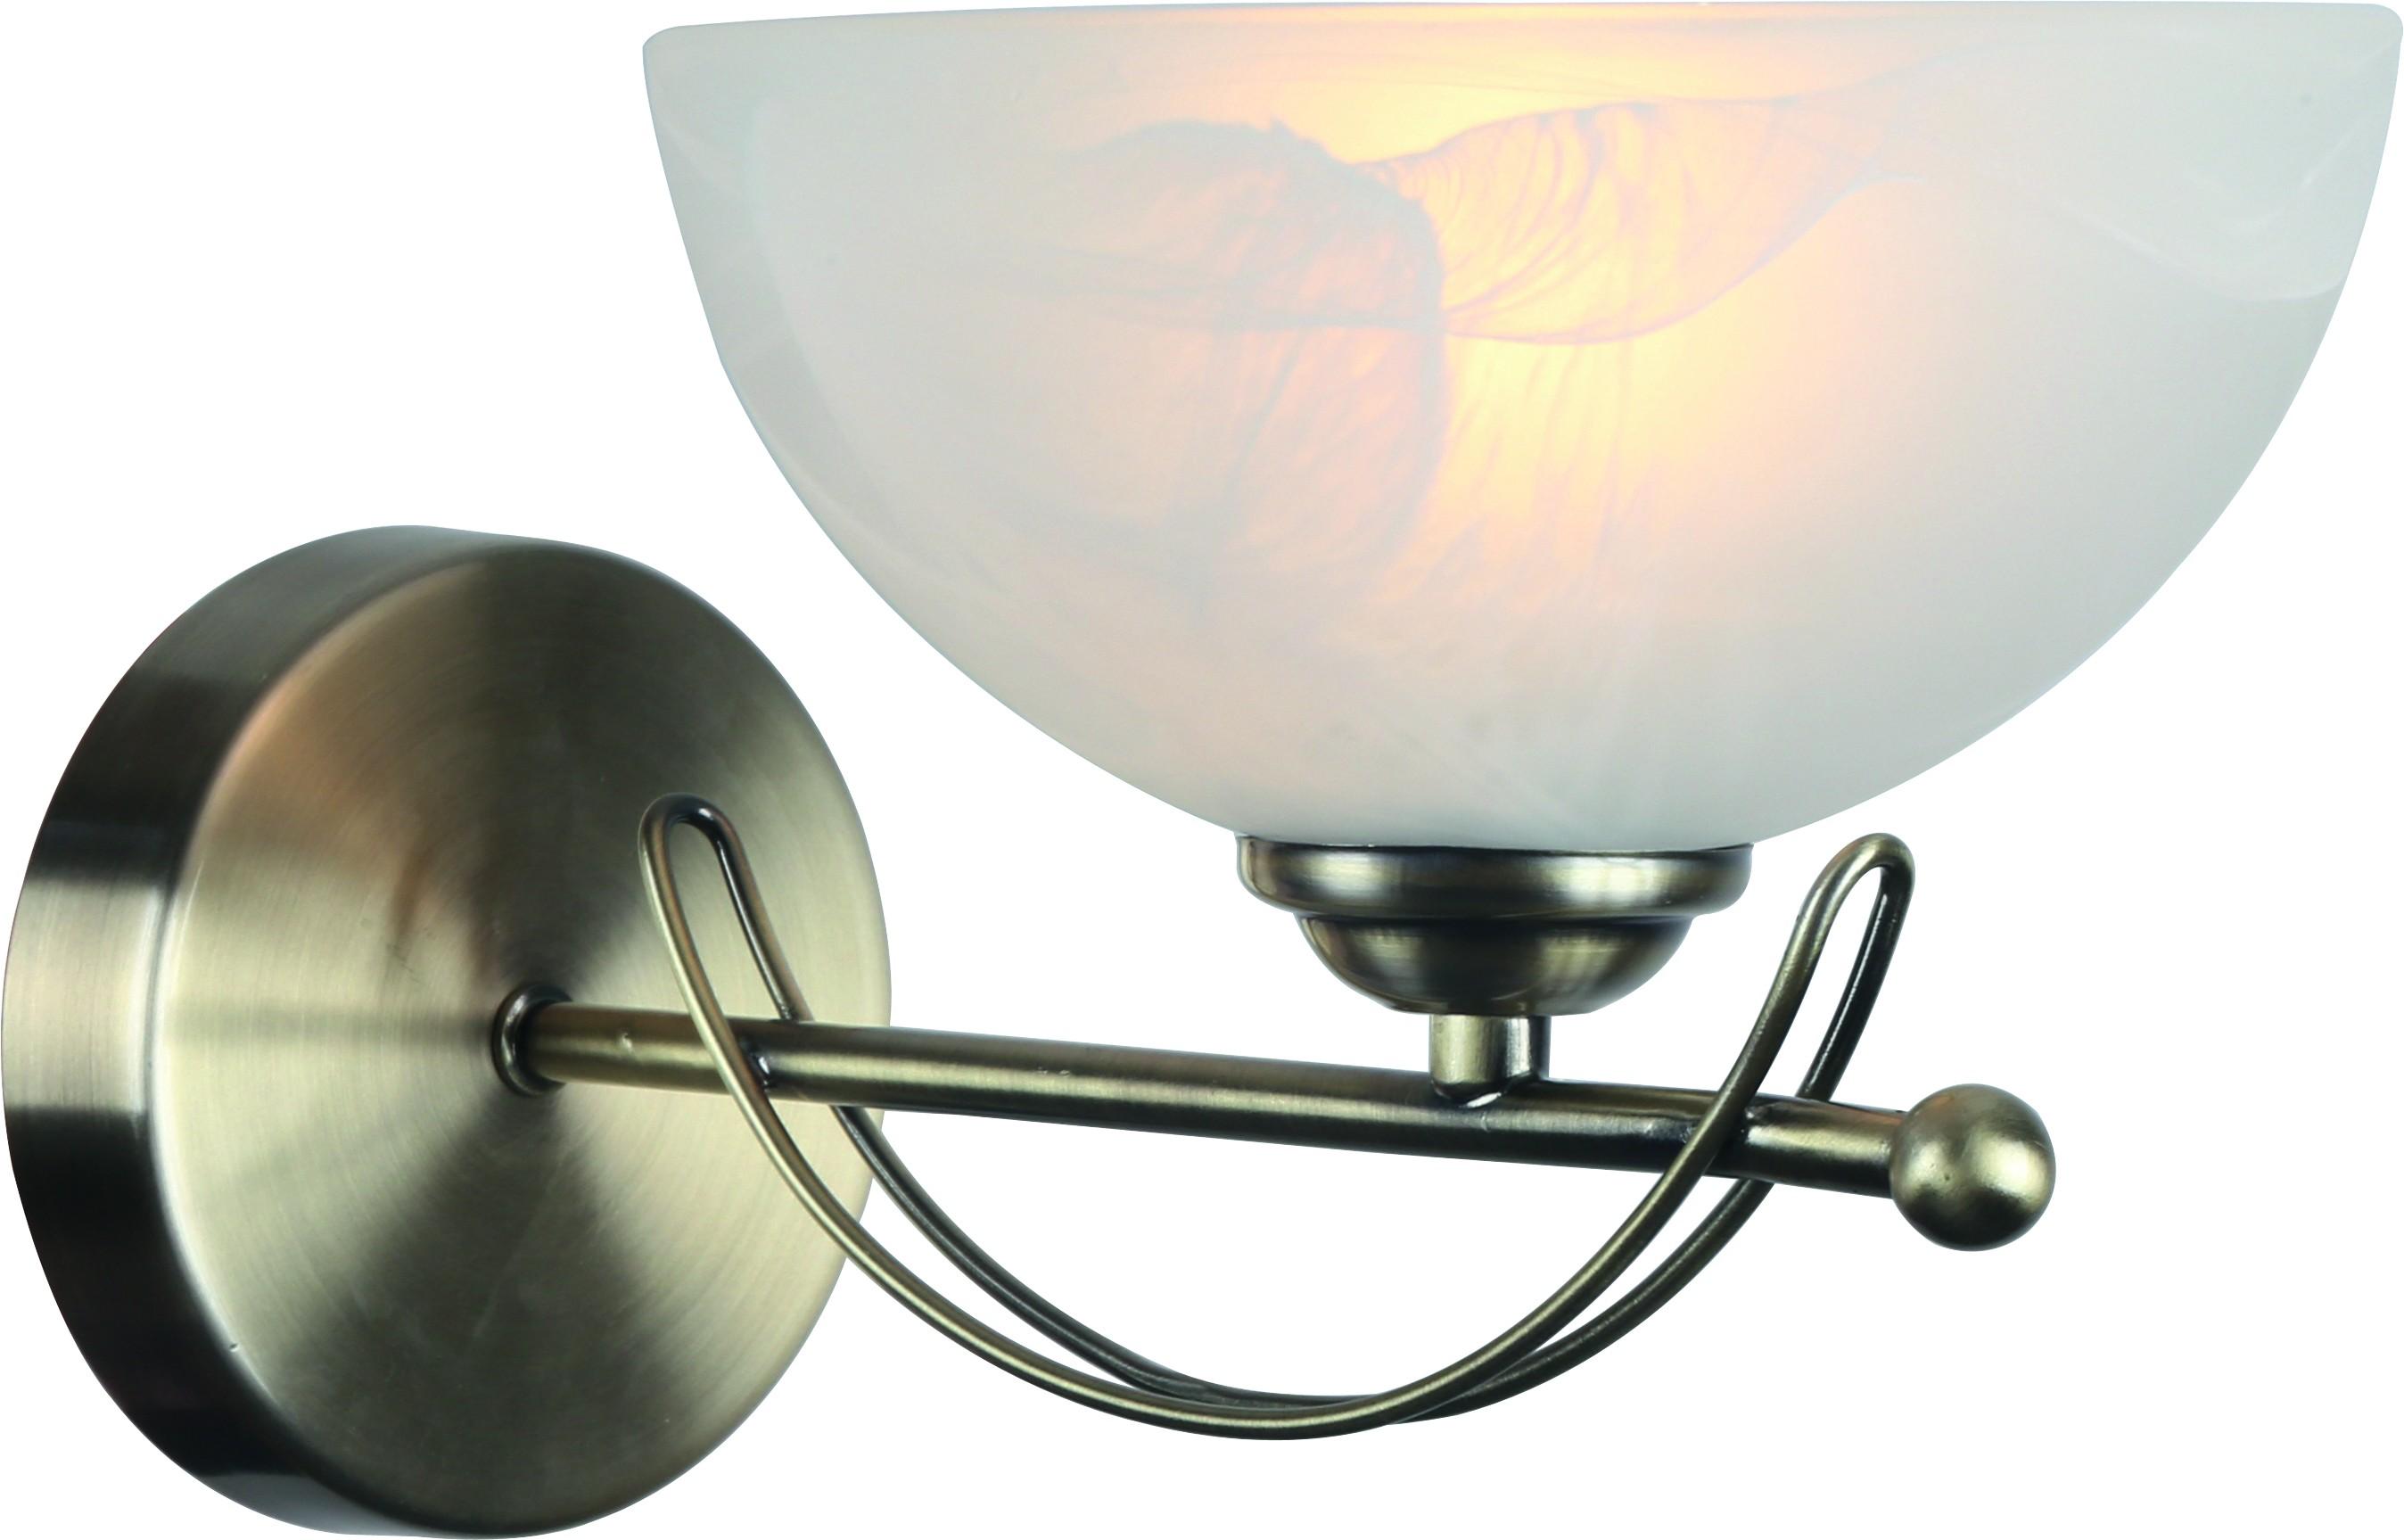 Бра Arte lamp A8615ap-1ab arte lamp бра arte lamp a8615ap 1ab